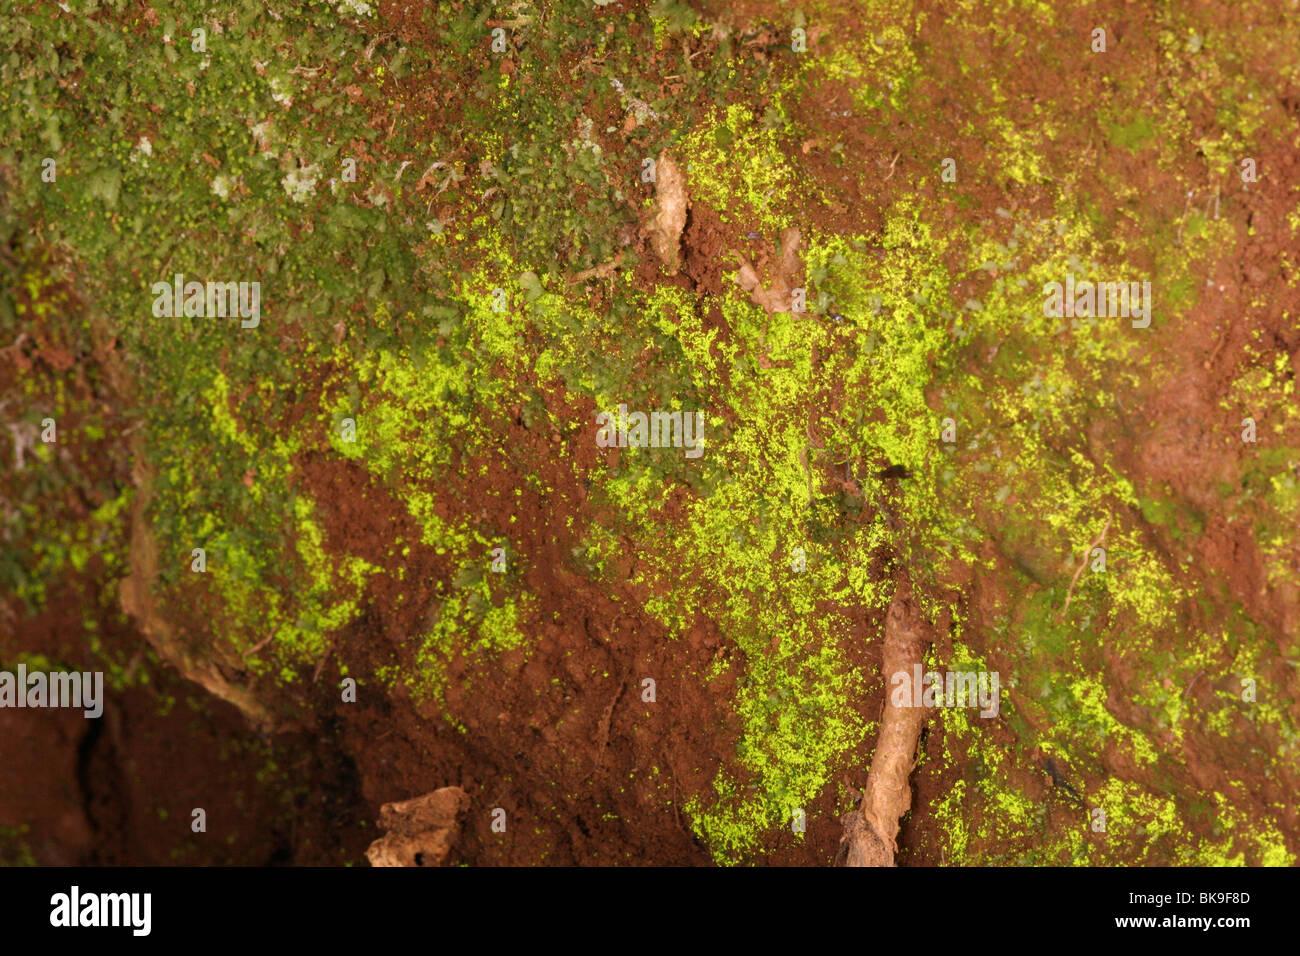 Luminous moss (Schistostega pennata) showing luminous protonema (Goblin lights) in a rabbit burrow, UK. - Stock Image